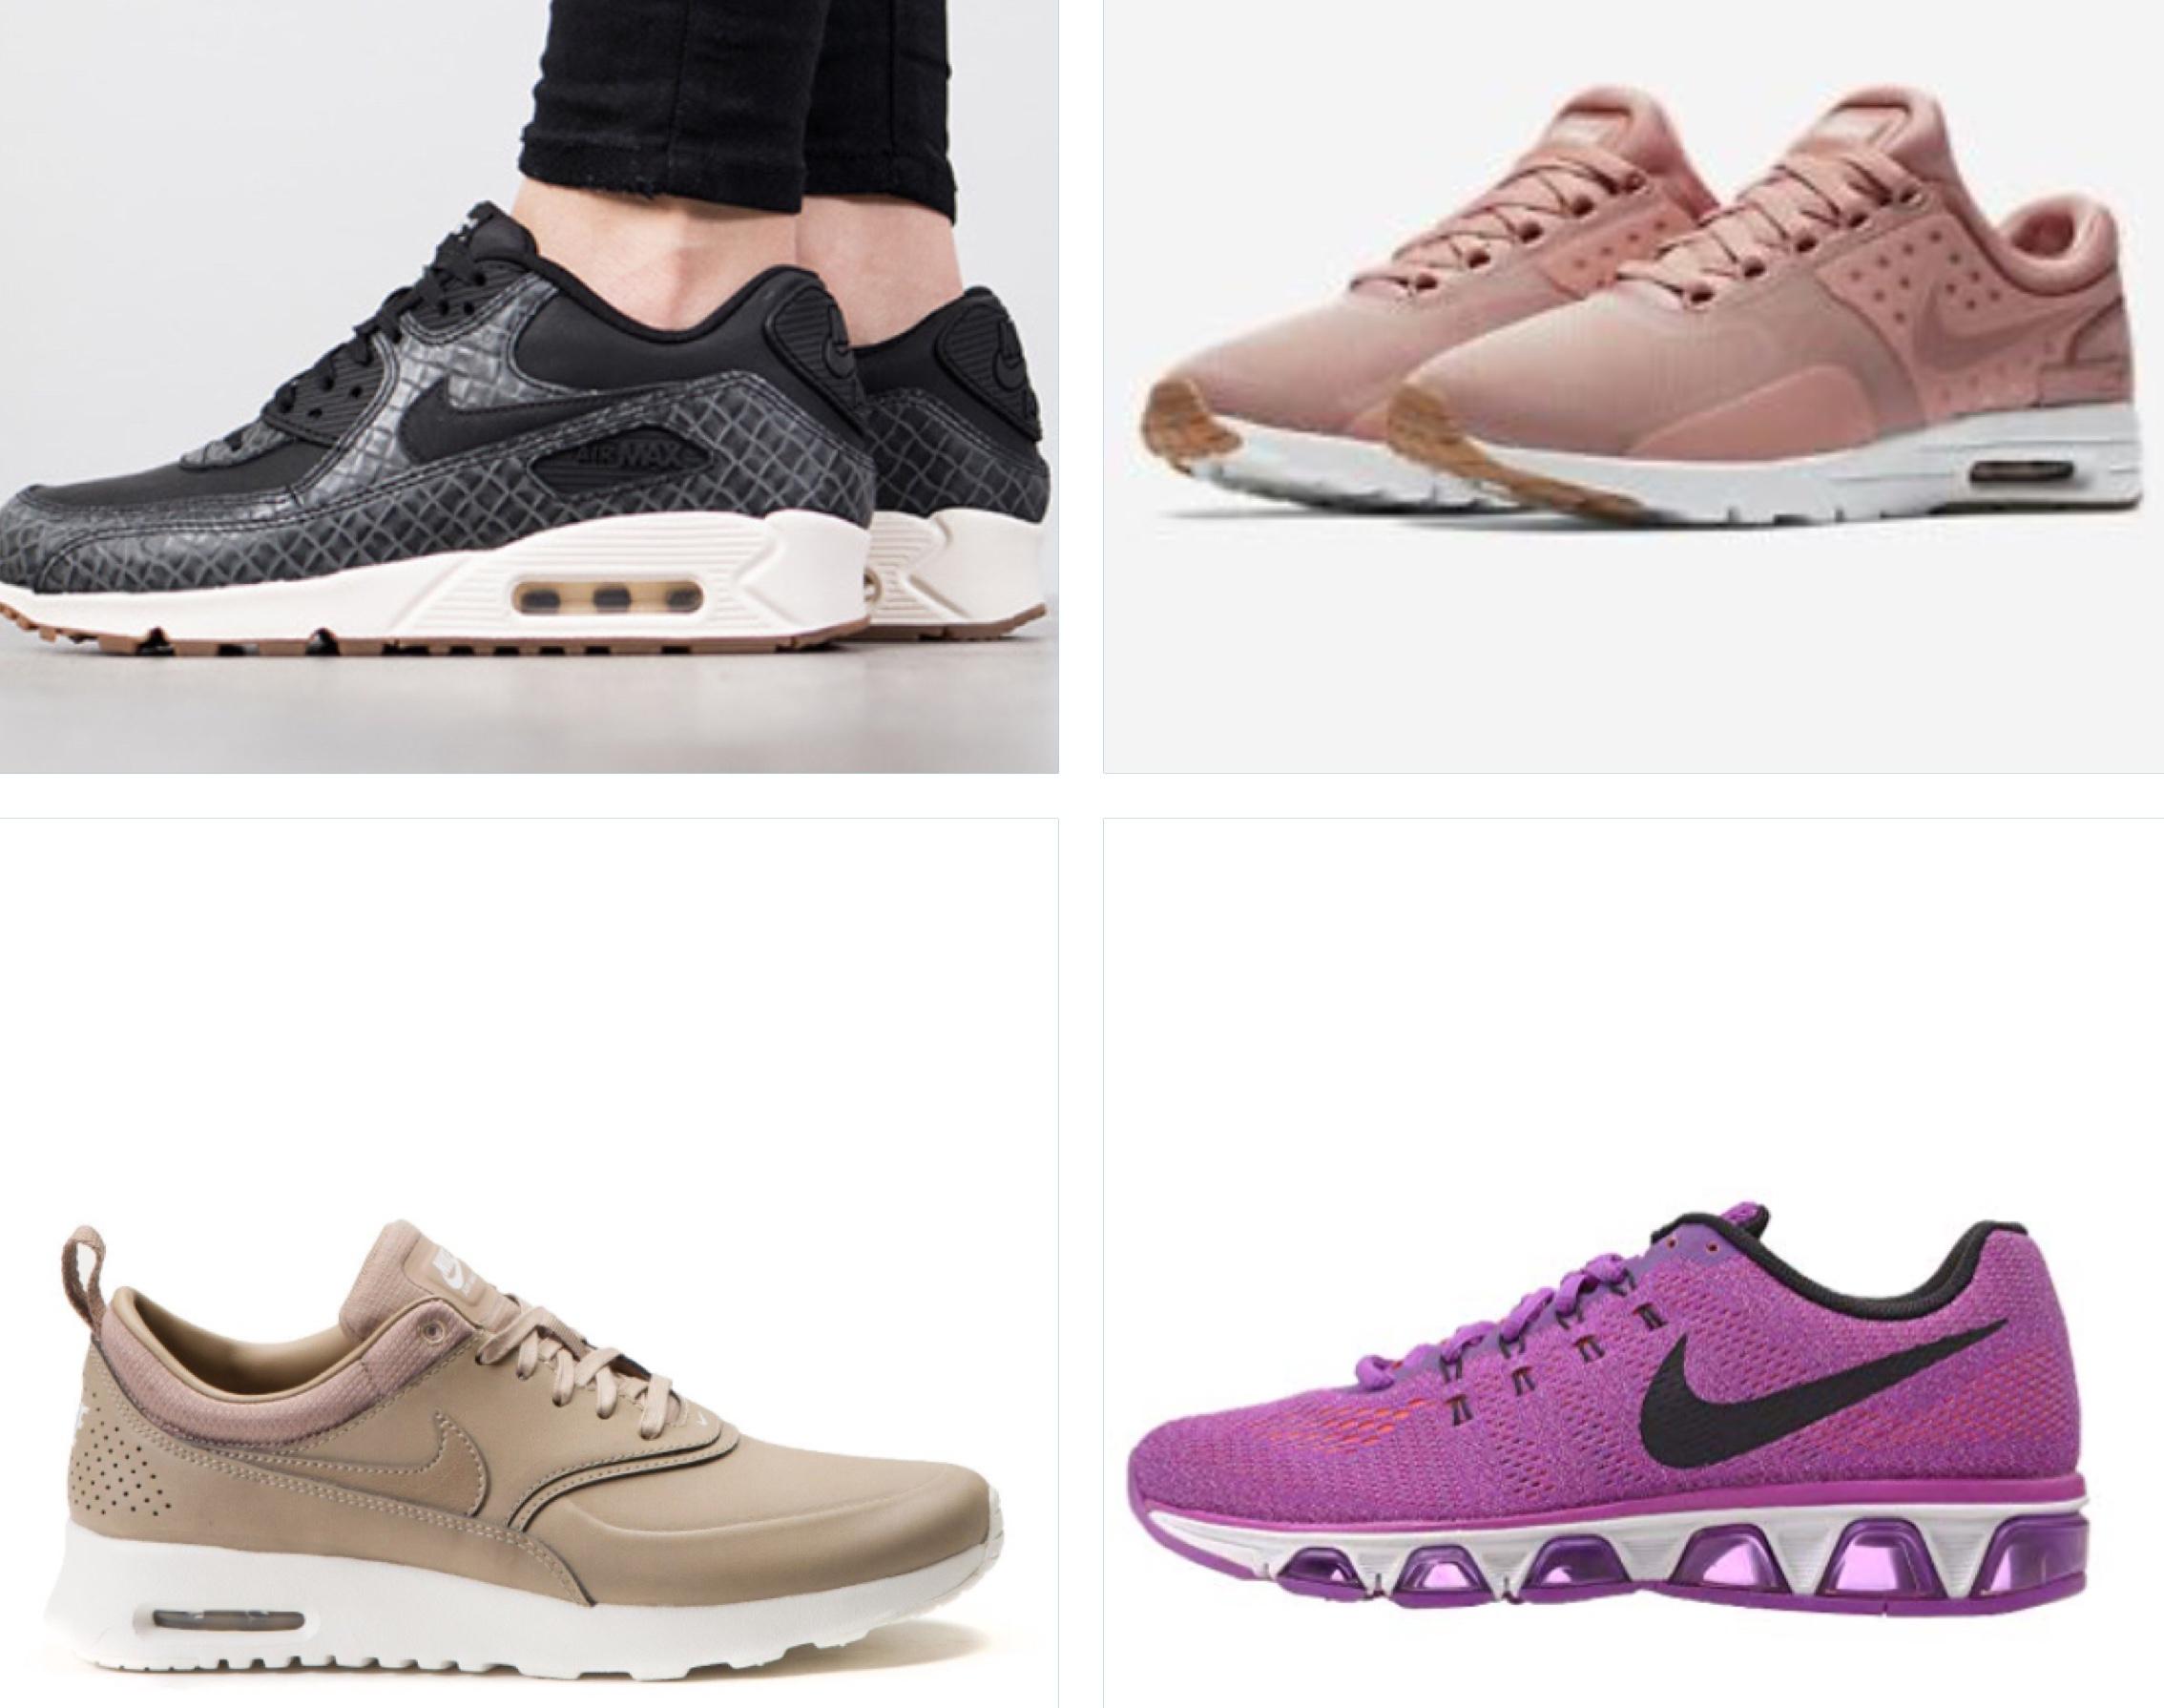 Women's Nike Air Max 90's, Thea, Zero & Tailwind £35 Nike Clearance Castleford